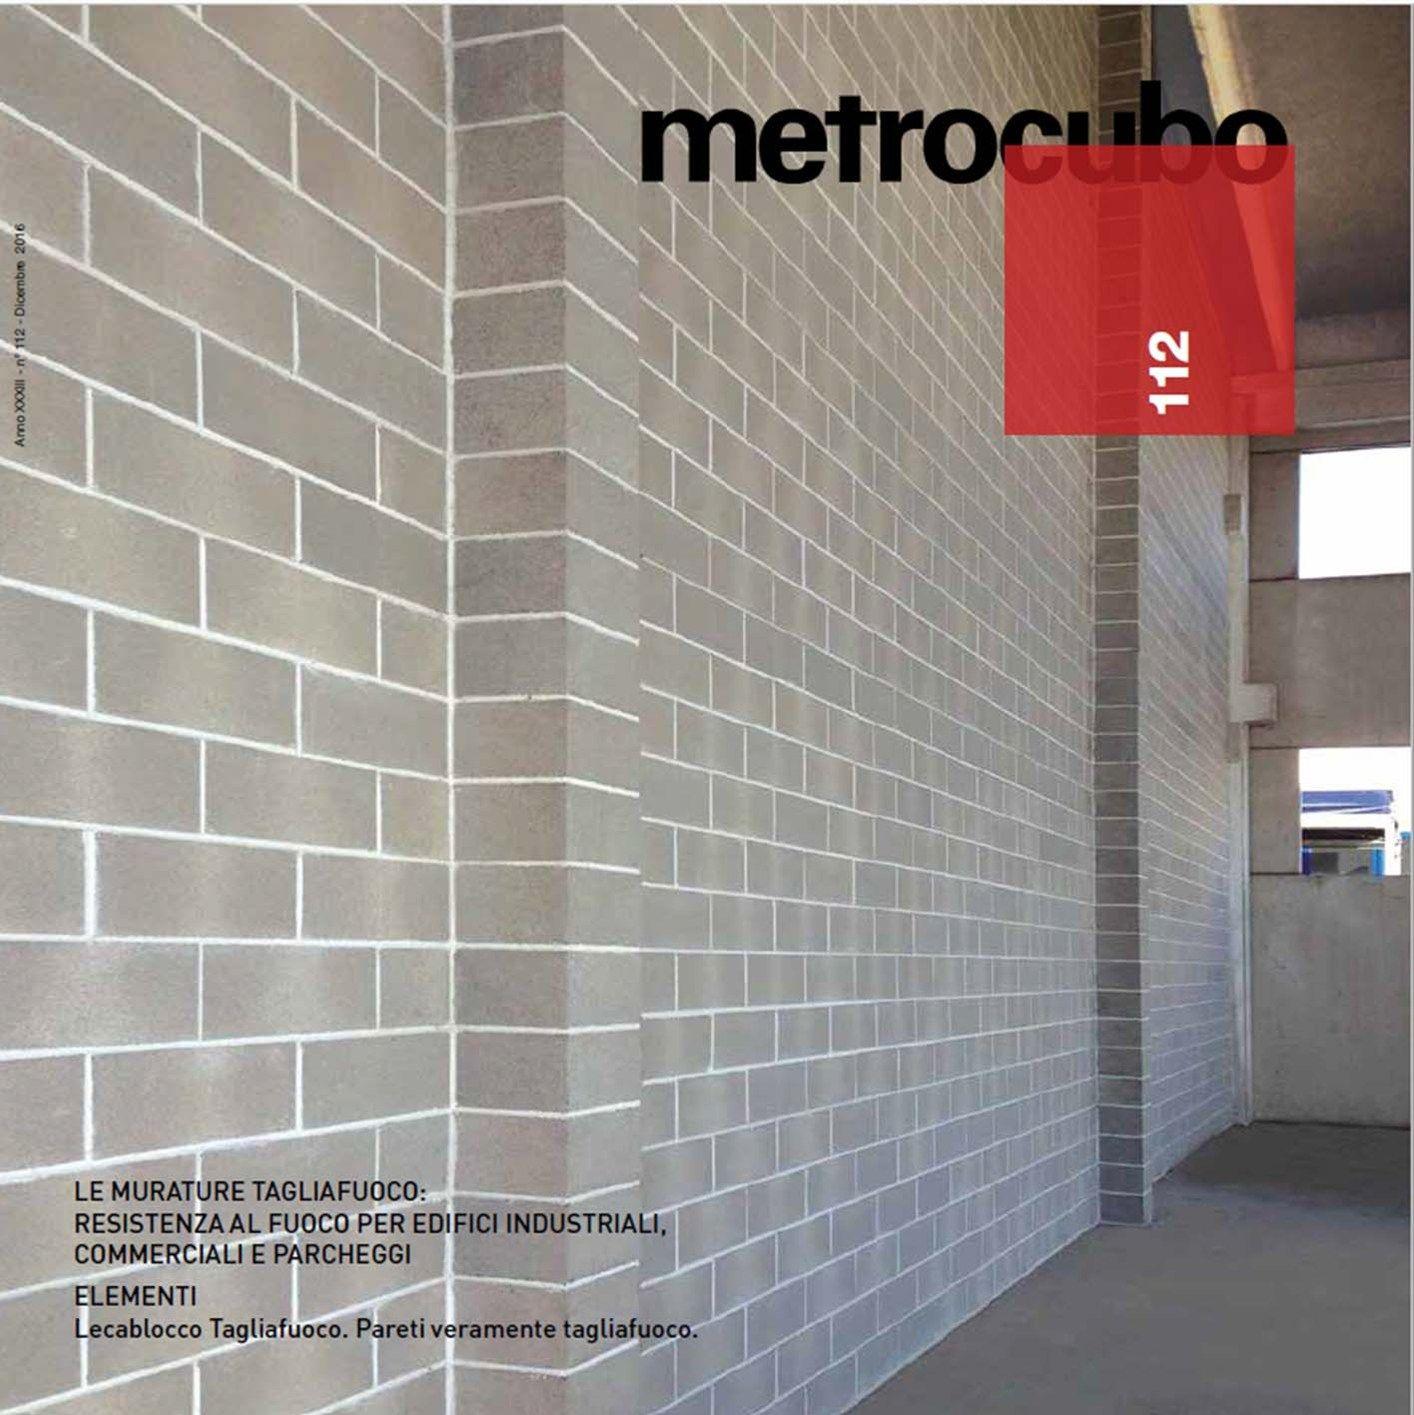 Anpel: Metrocubo 112, focus sulle murature tagliafuoco